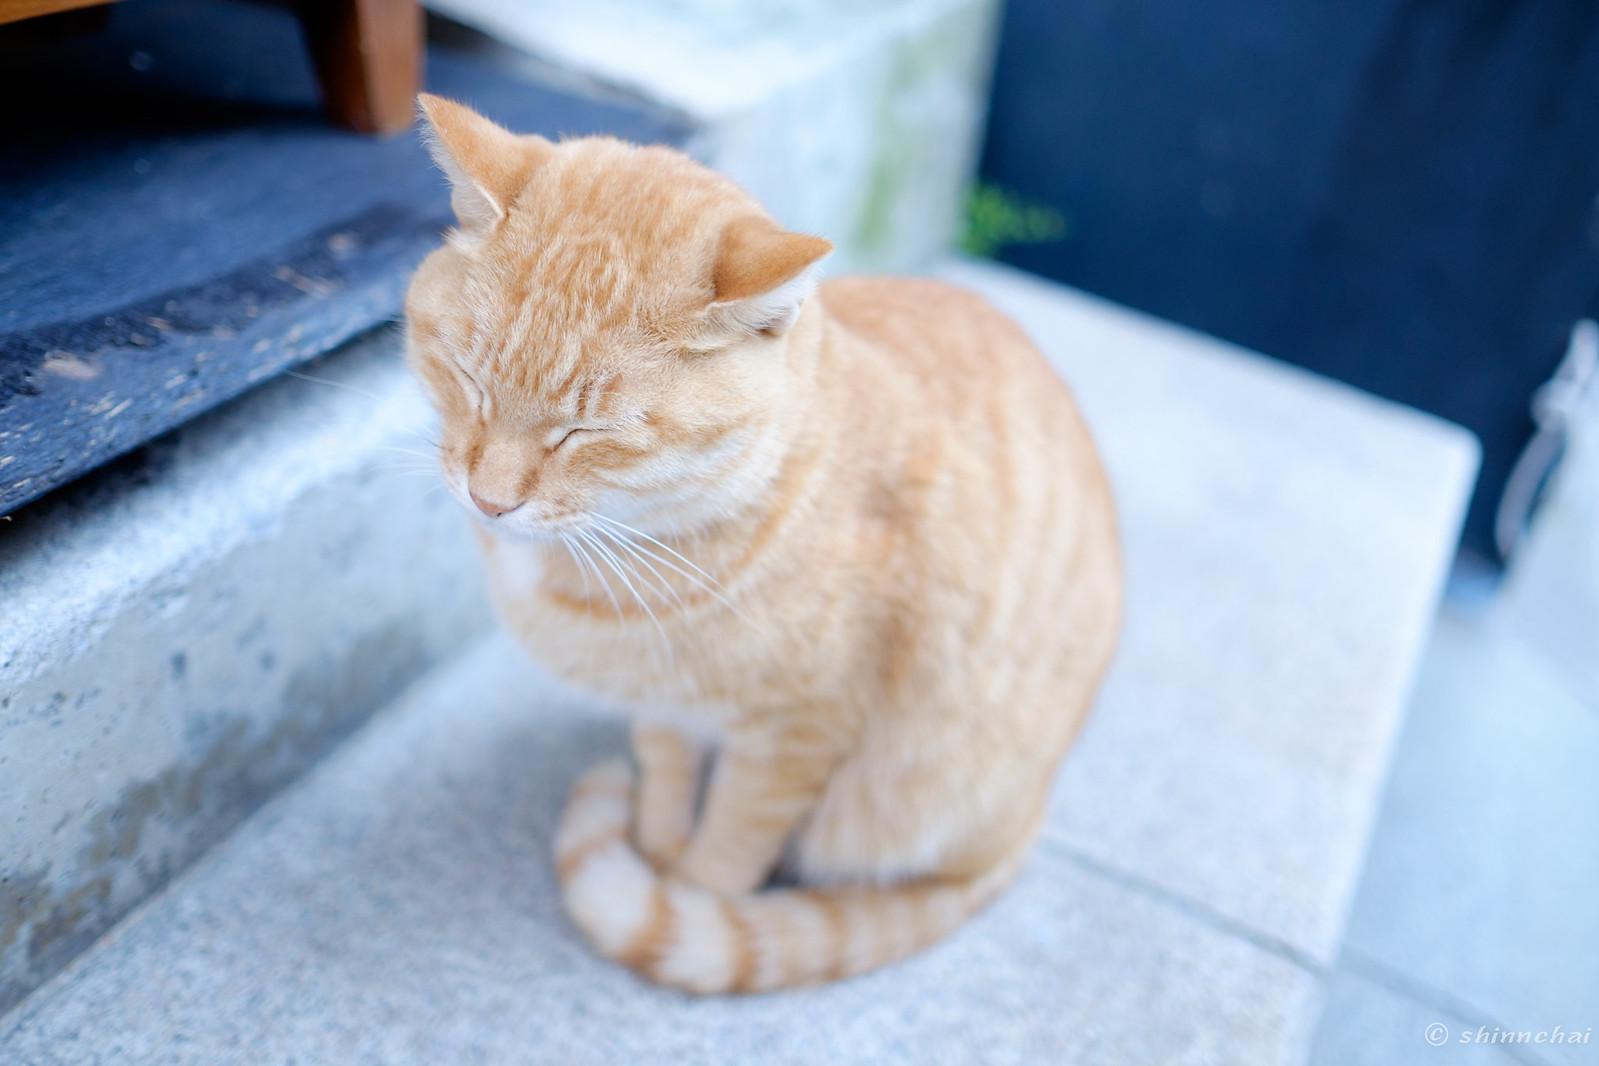 xf23mm f1.4 rの作例 レビュー 江ノ島 猫